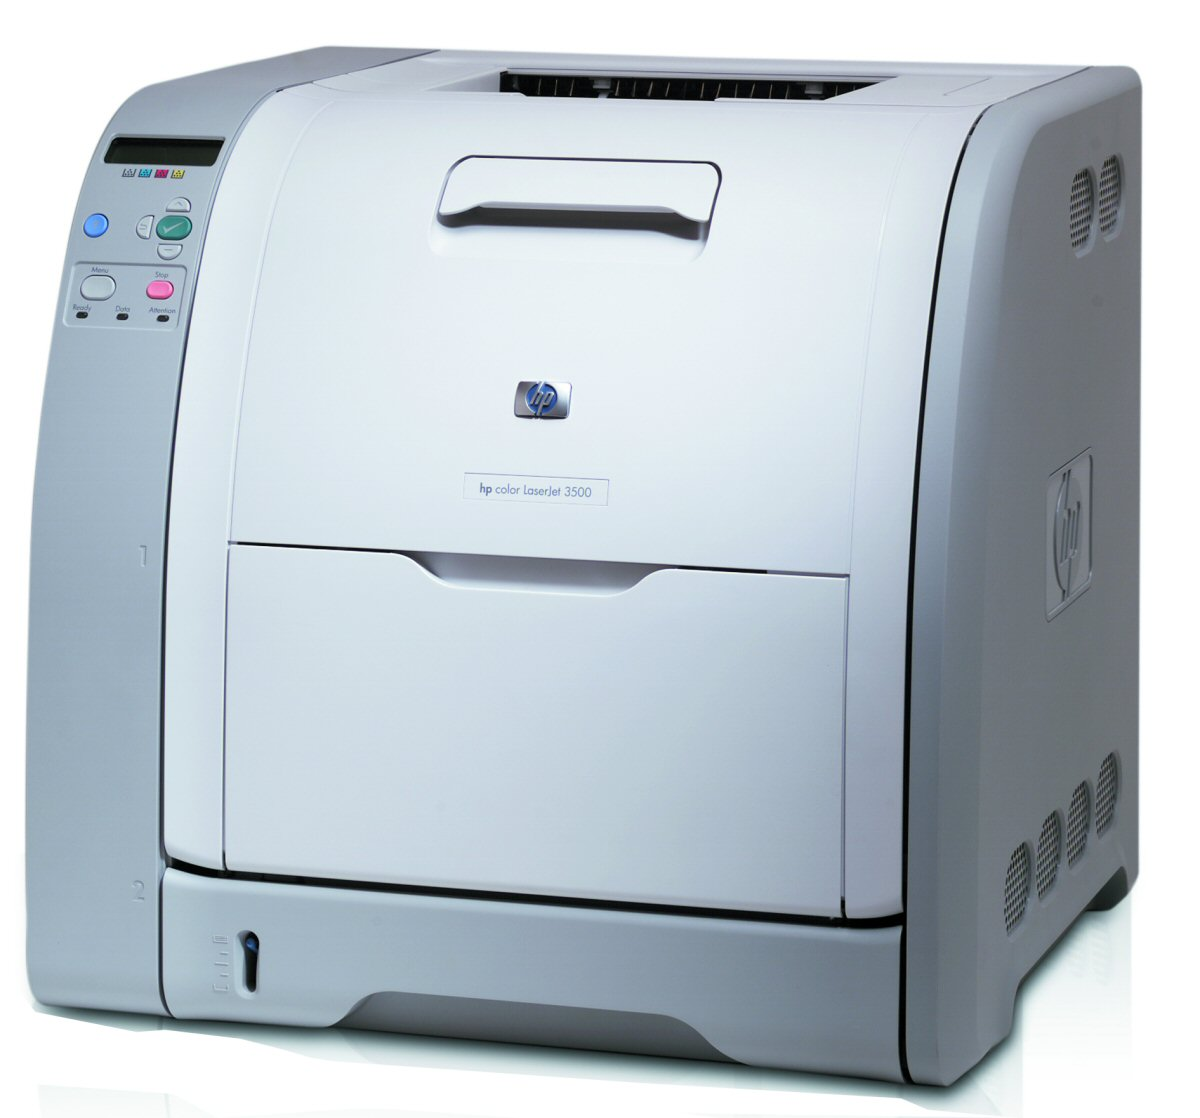 Paper Tray //Feeder 4 Color Laserjet 3500 3700 Series 500 Sheet HP Q2486A Media